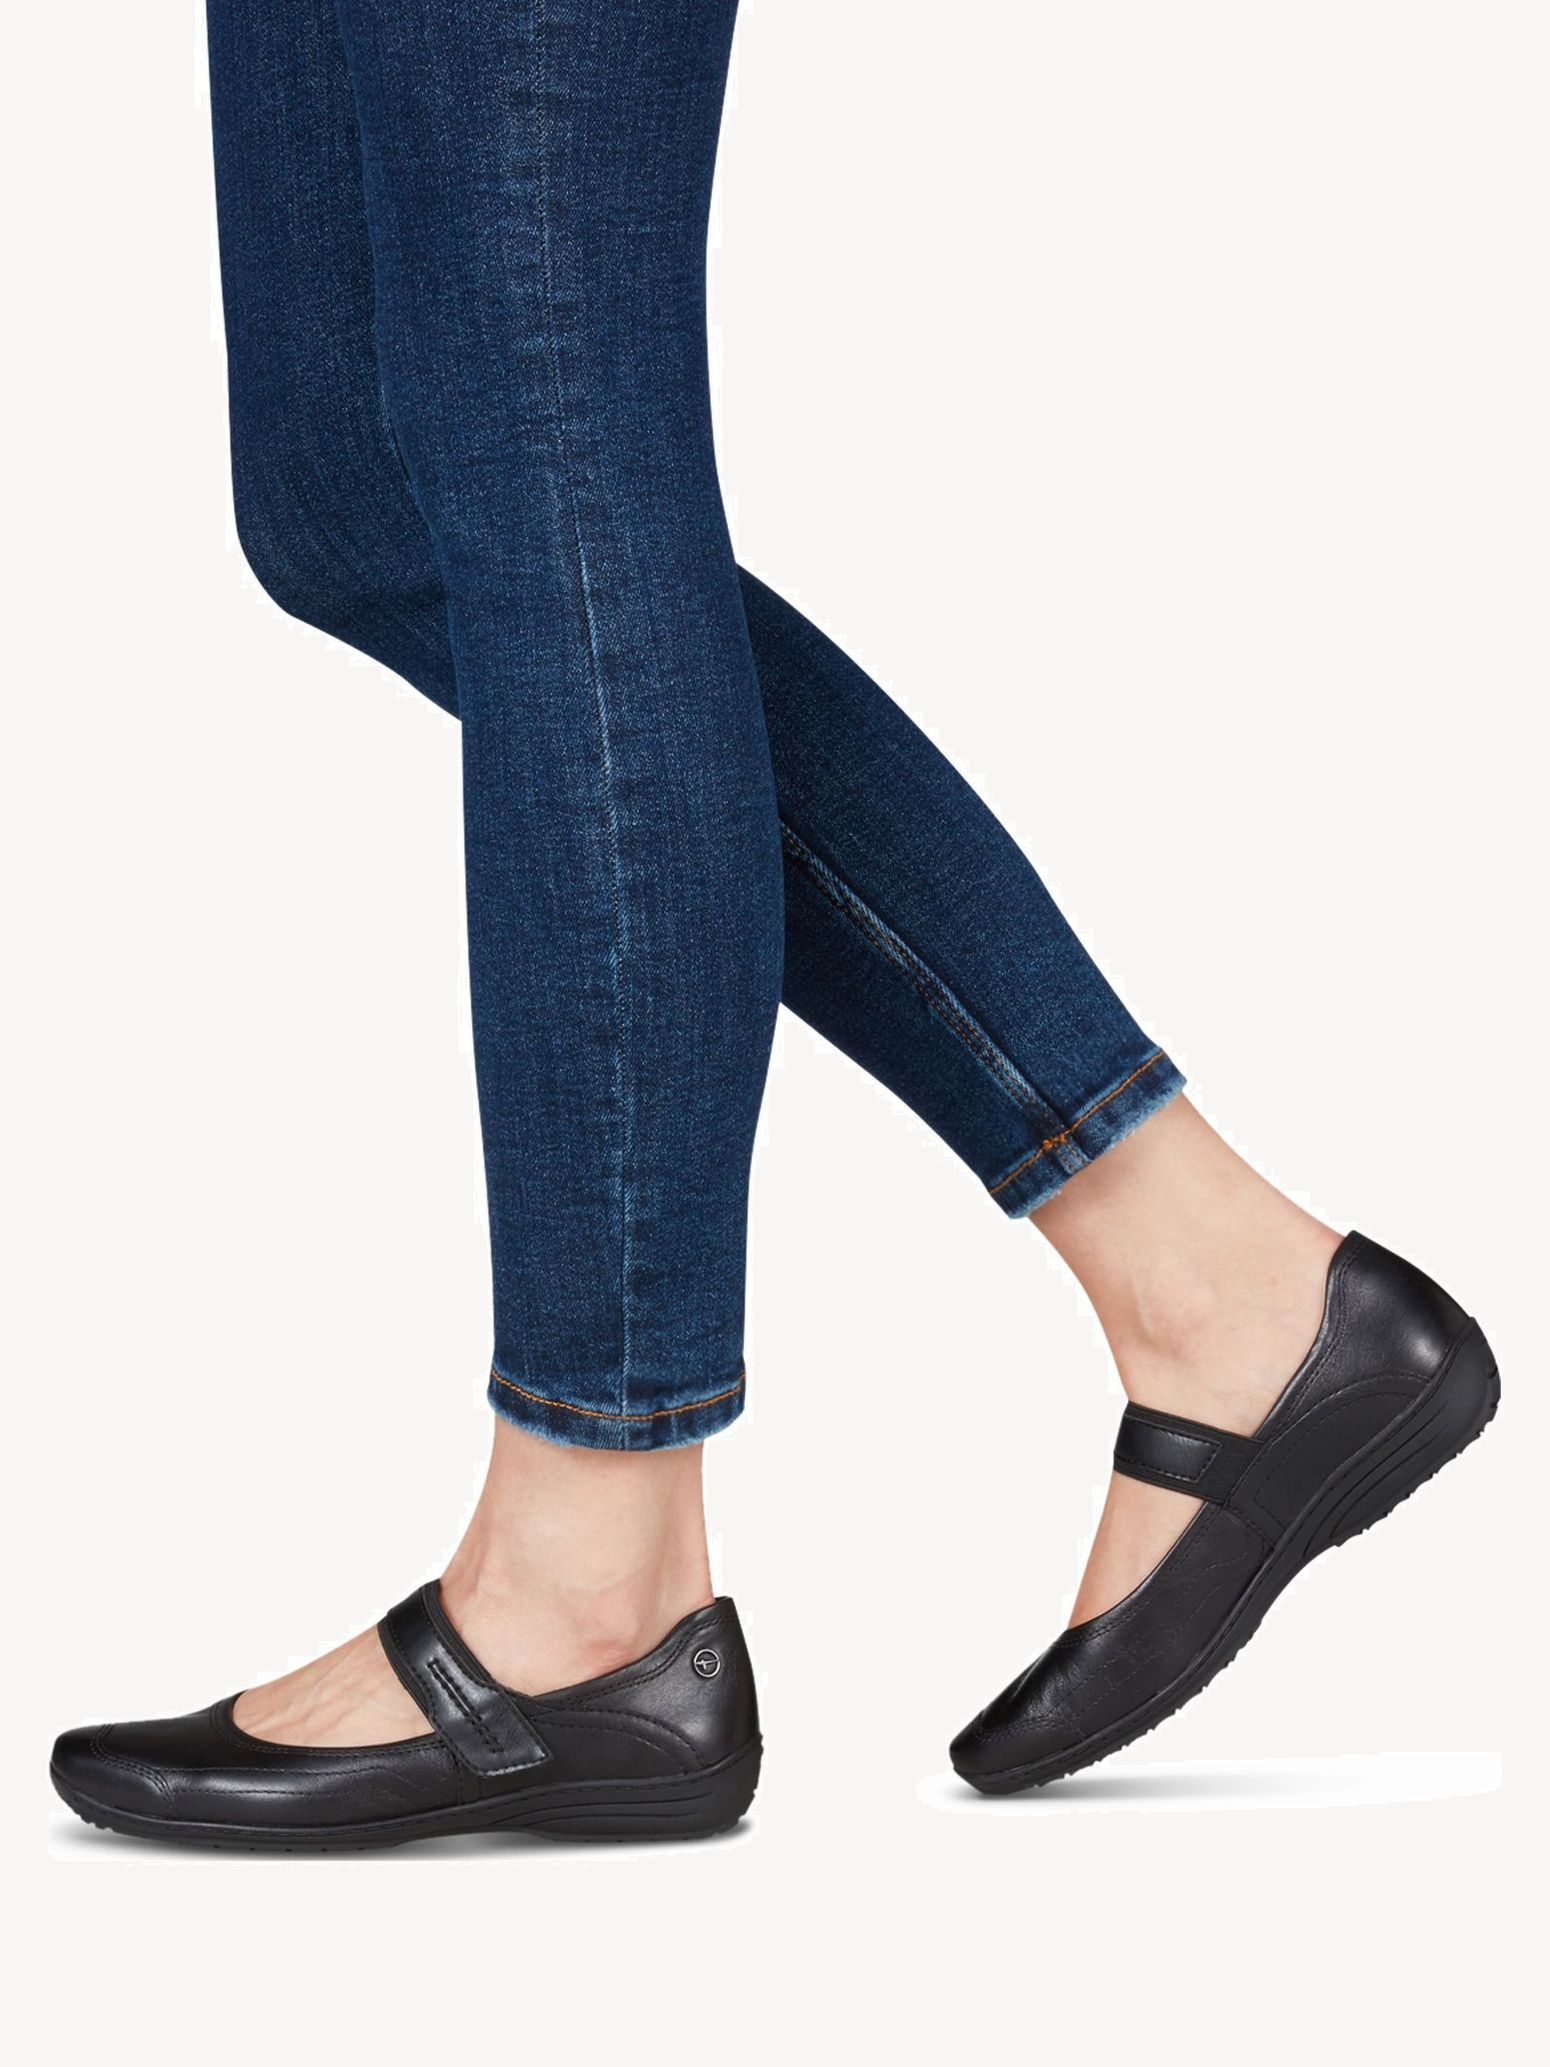 Hitam 1 24601 21 Buy Tamaris Ballerinas Online Tendencies Sandals Footbed 2 Strap Black 40 Hi Res